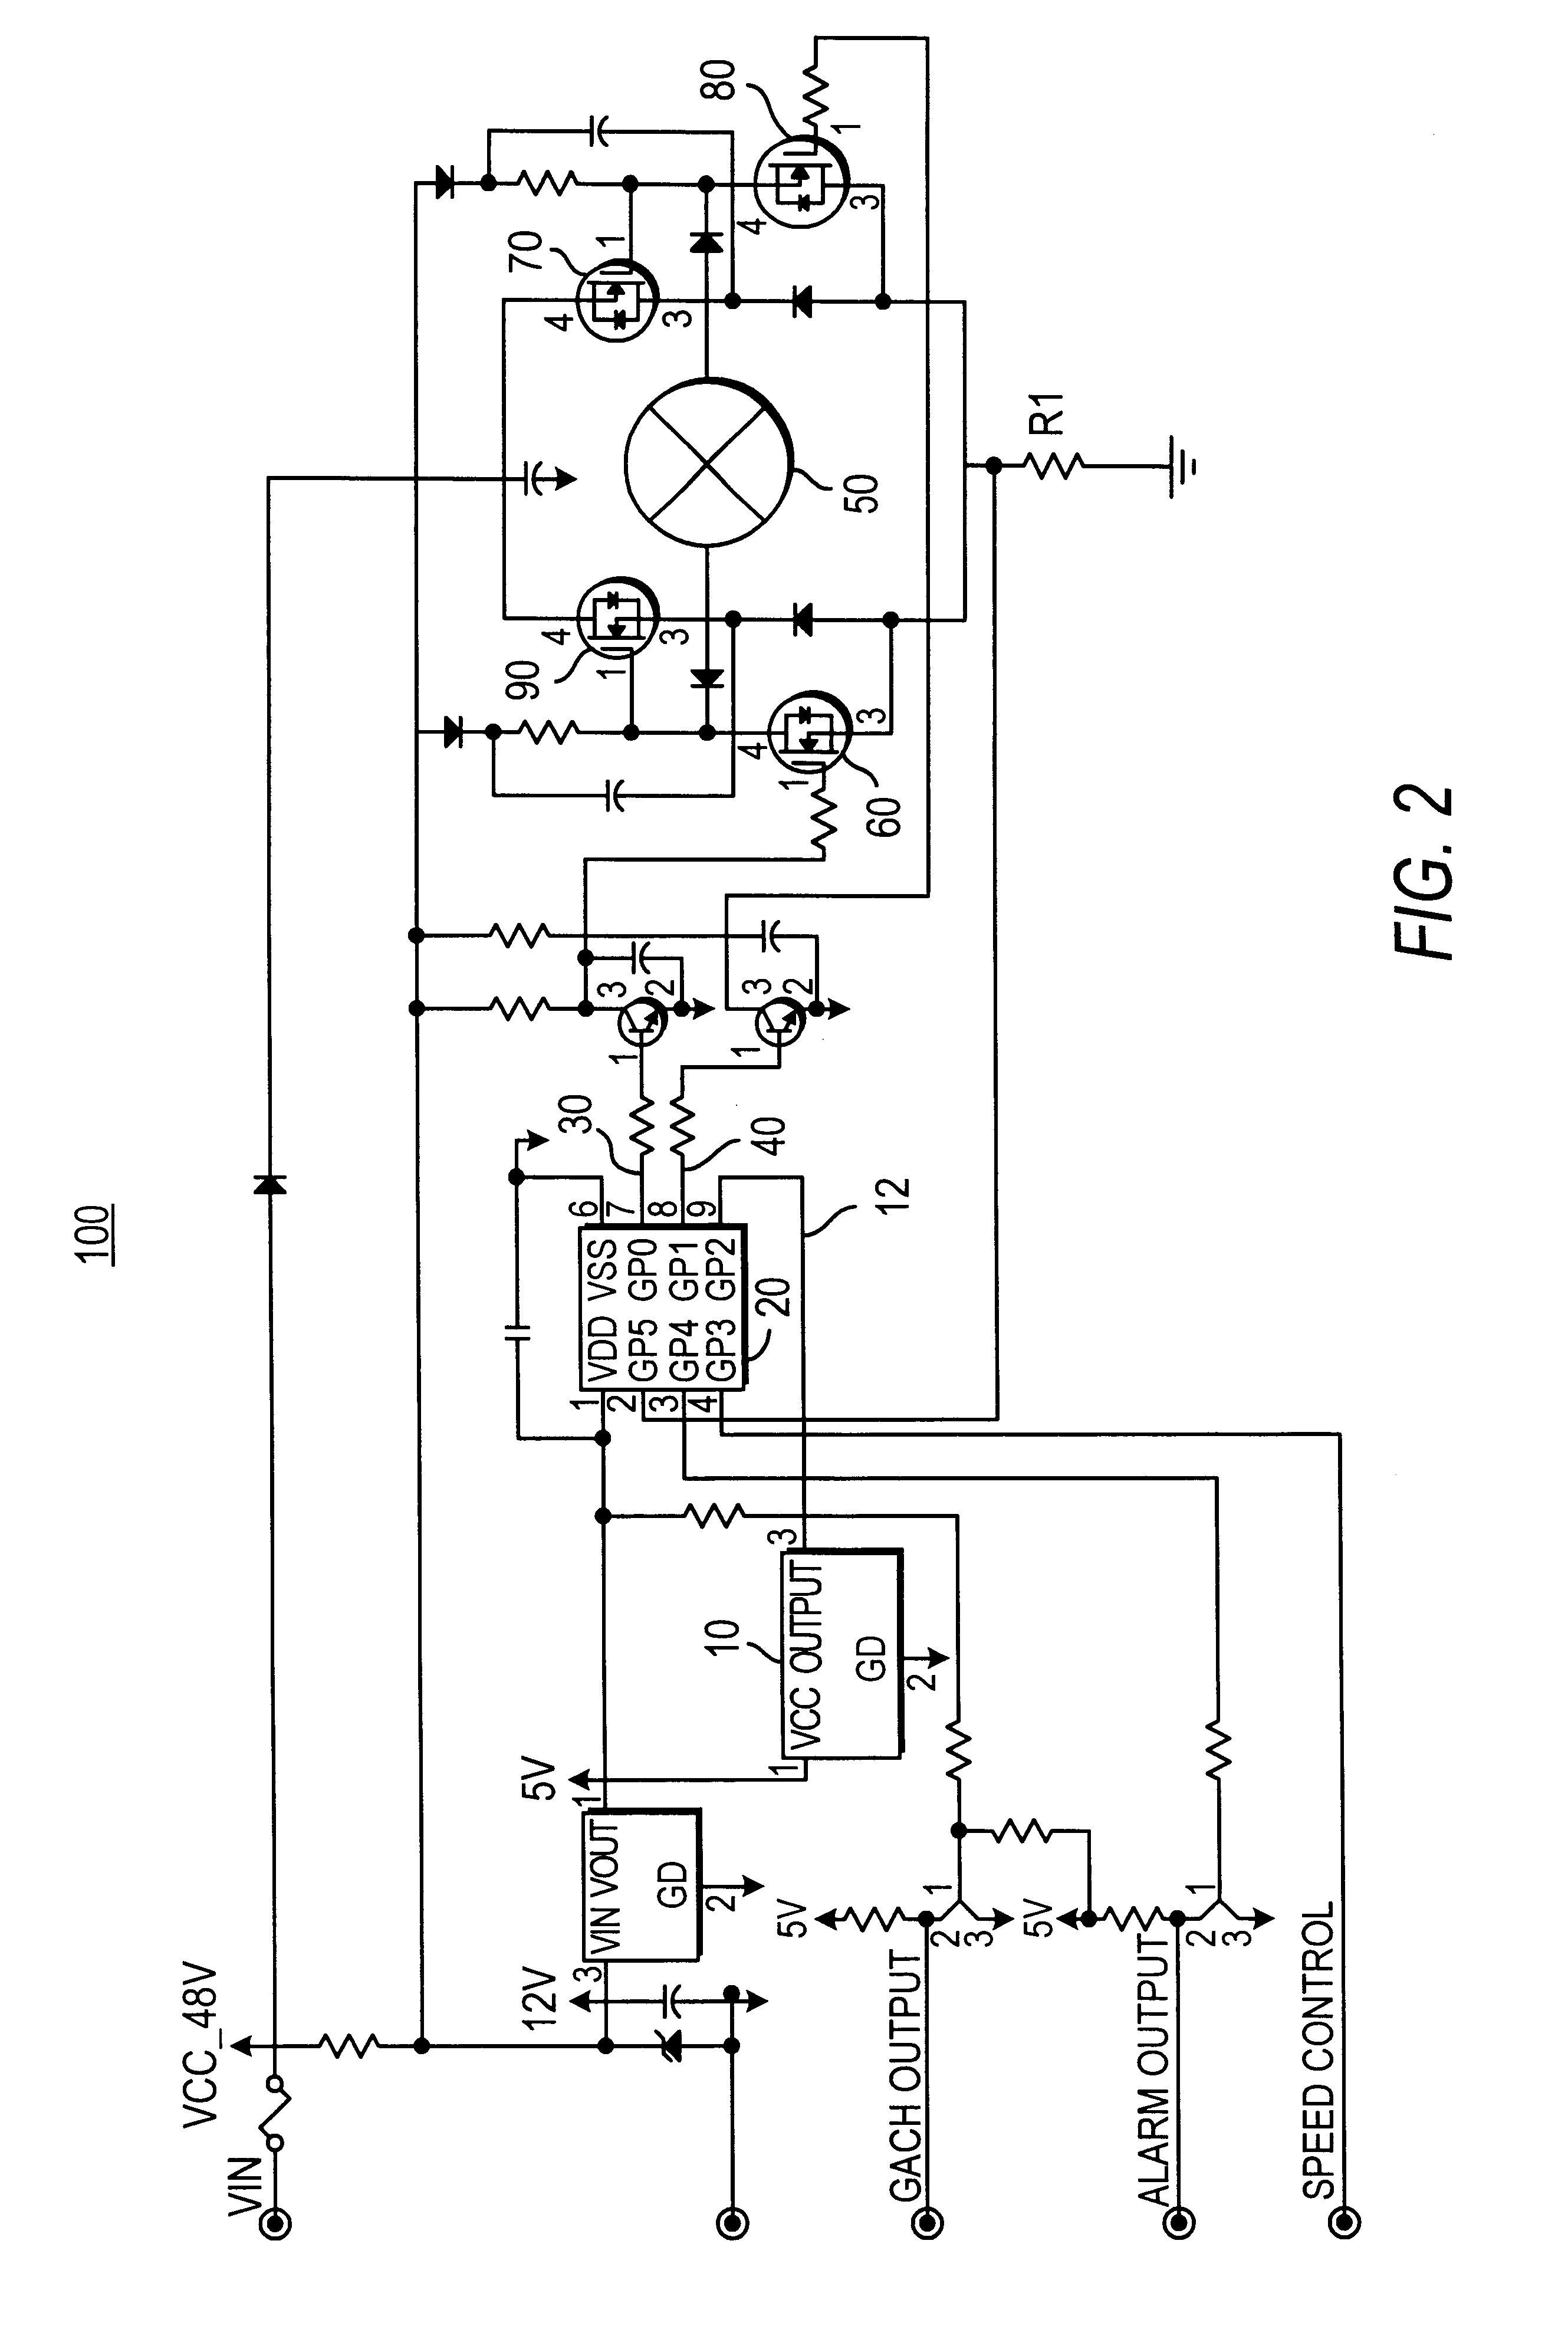 Cutler Hammer Motor Starter Wiring Diagram 2 Control Wiring Diagram for Dol Starter Fresh Magnetic Starter Of Cutler Hammer Motor Starter Wiring Diagram 2